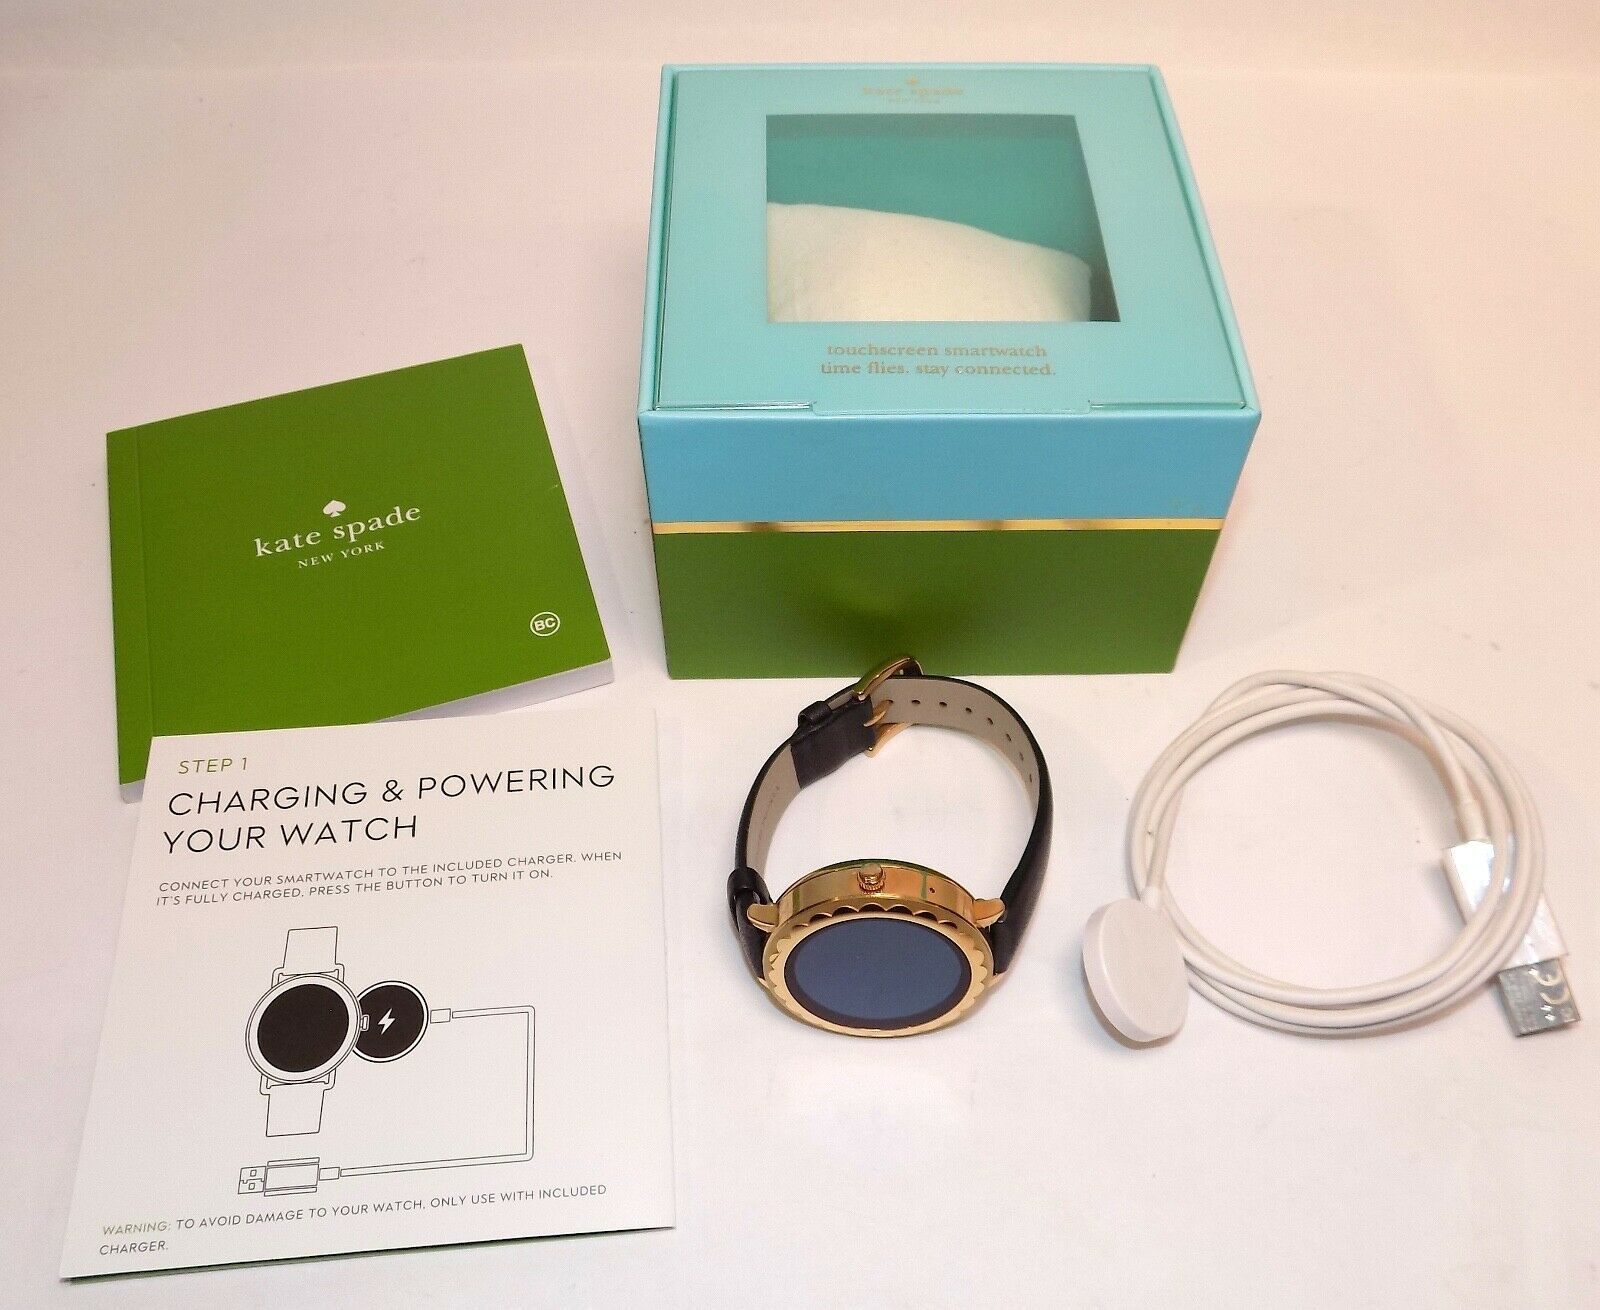 Kate Spade Dw5k1 Gold Tone 42mm Scallop Ladies Smartwatch W Box For Sale Online